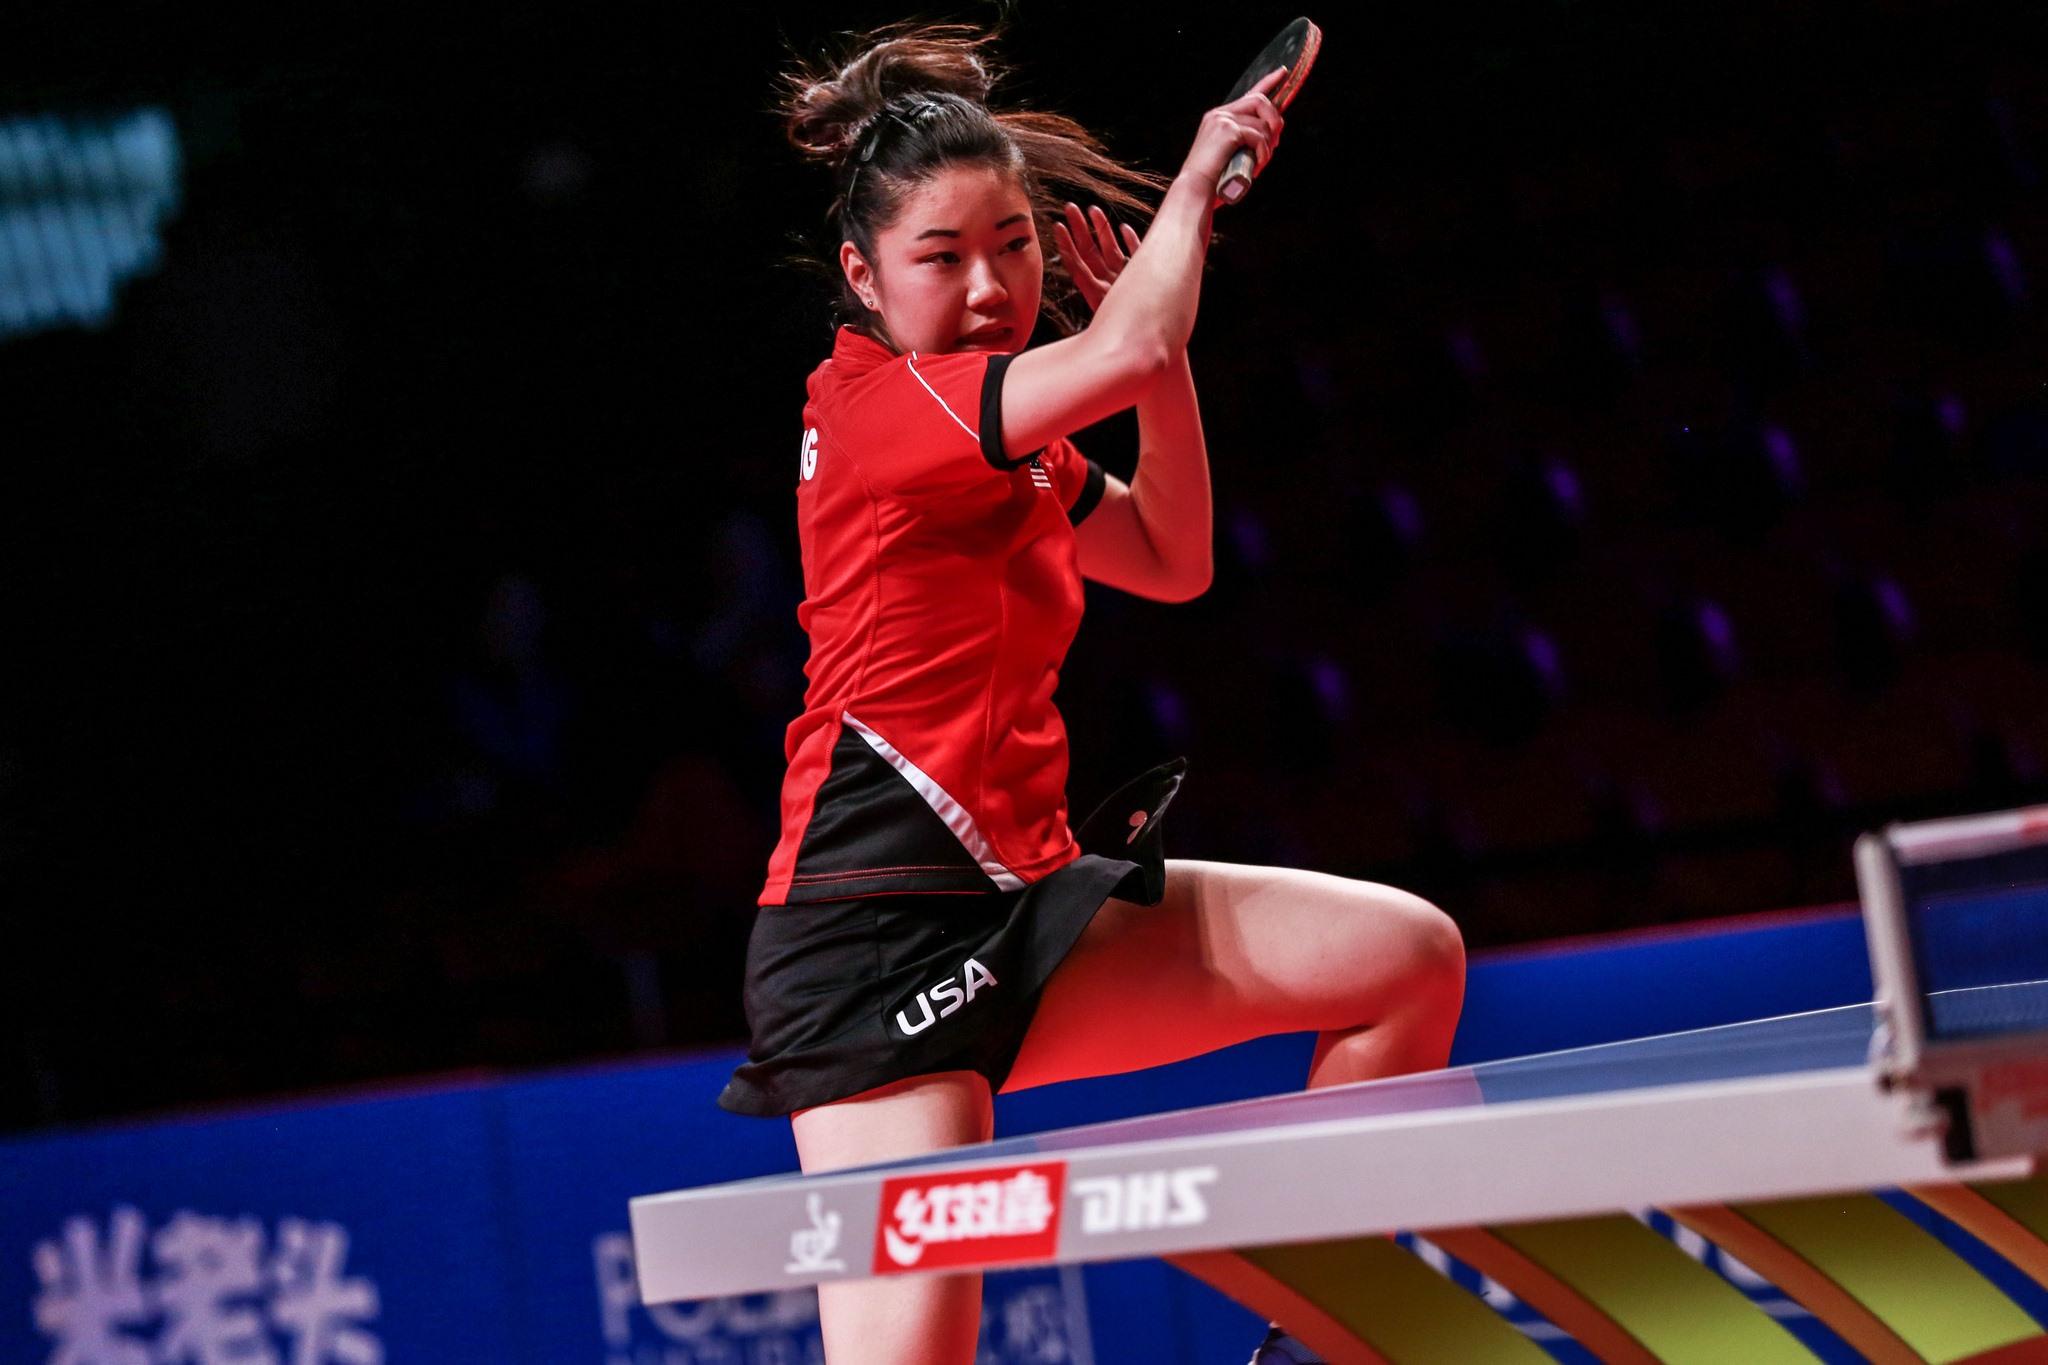 2017 Women's World Cup - ZHANG Lily(USA) Vs SUH Hyowon(KOR)